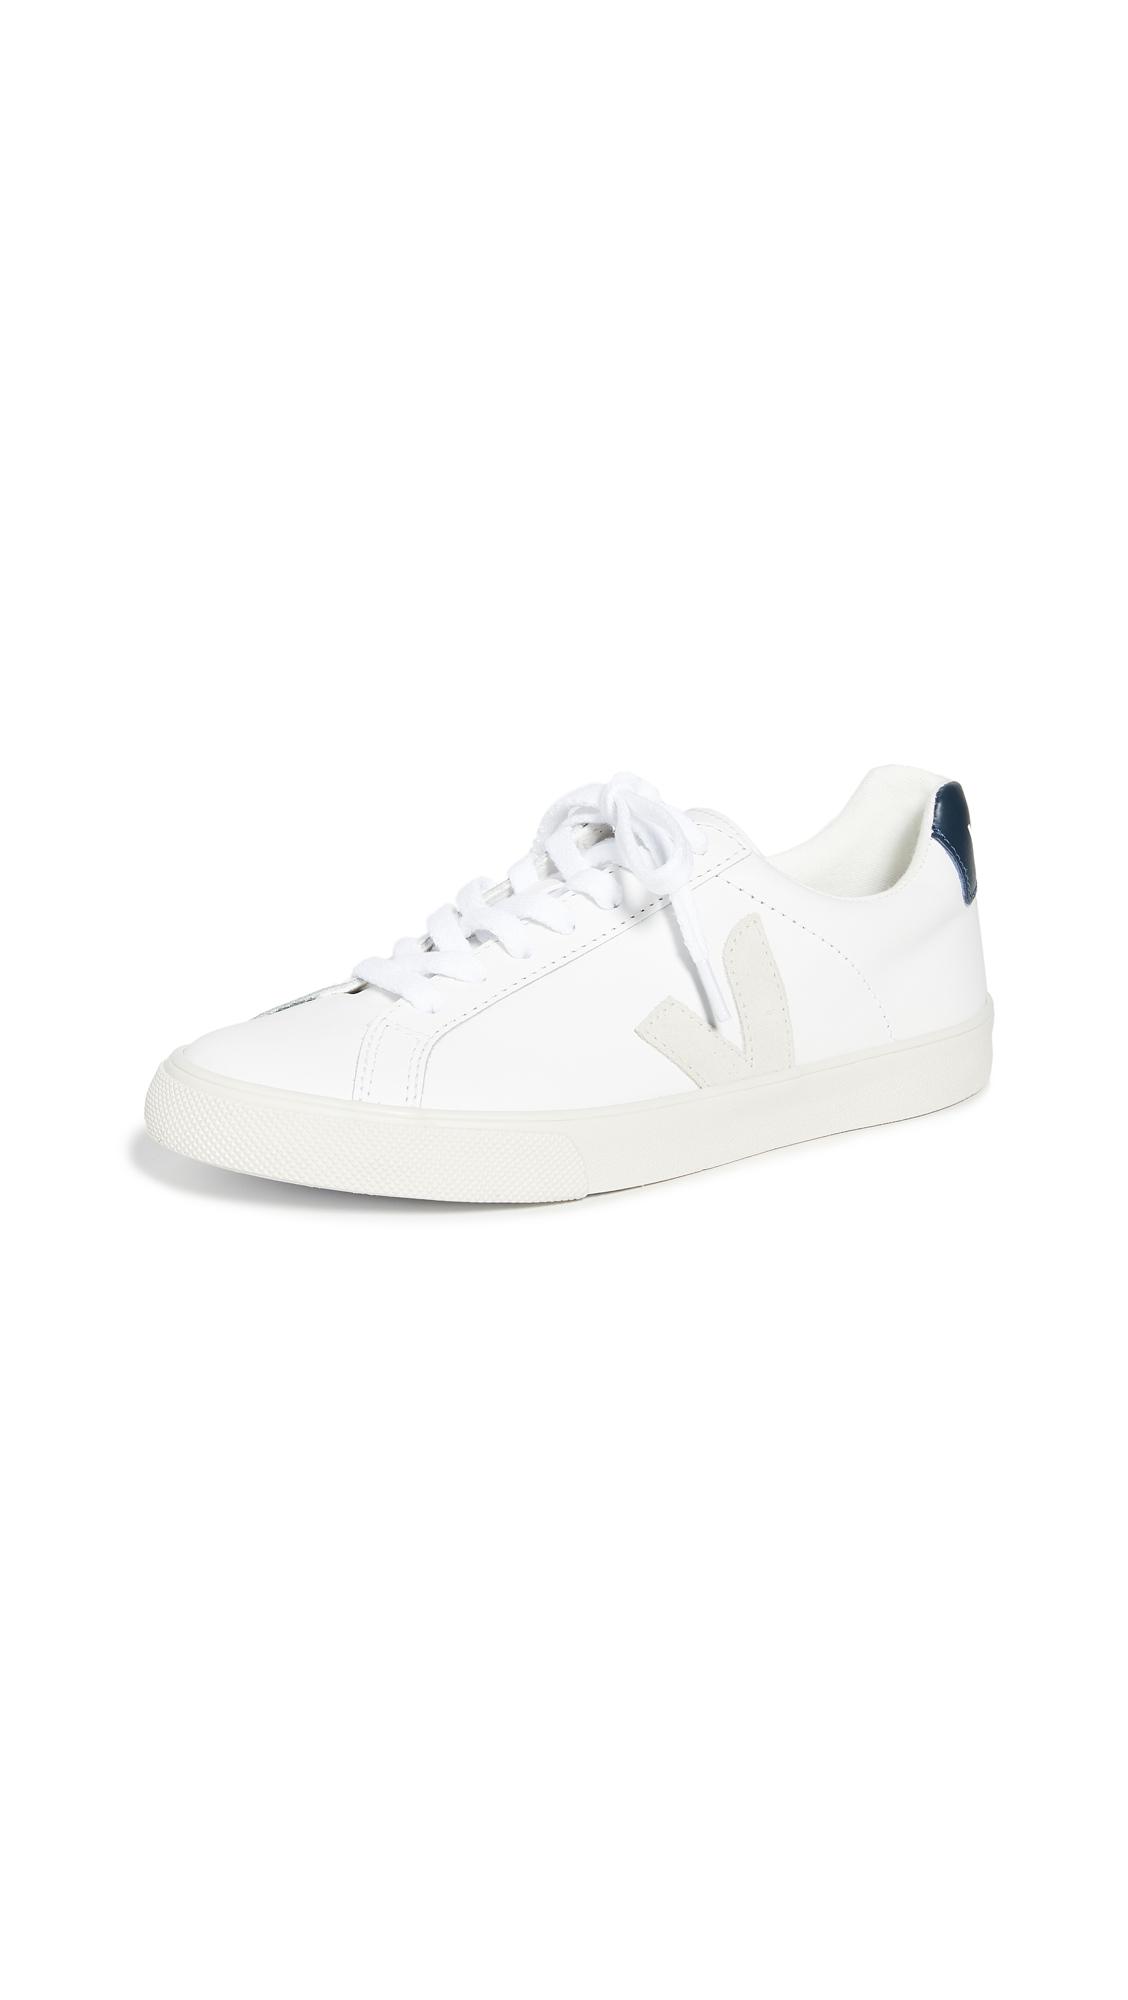 Veja Esplar Logo Sneakers In Extra